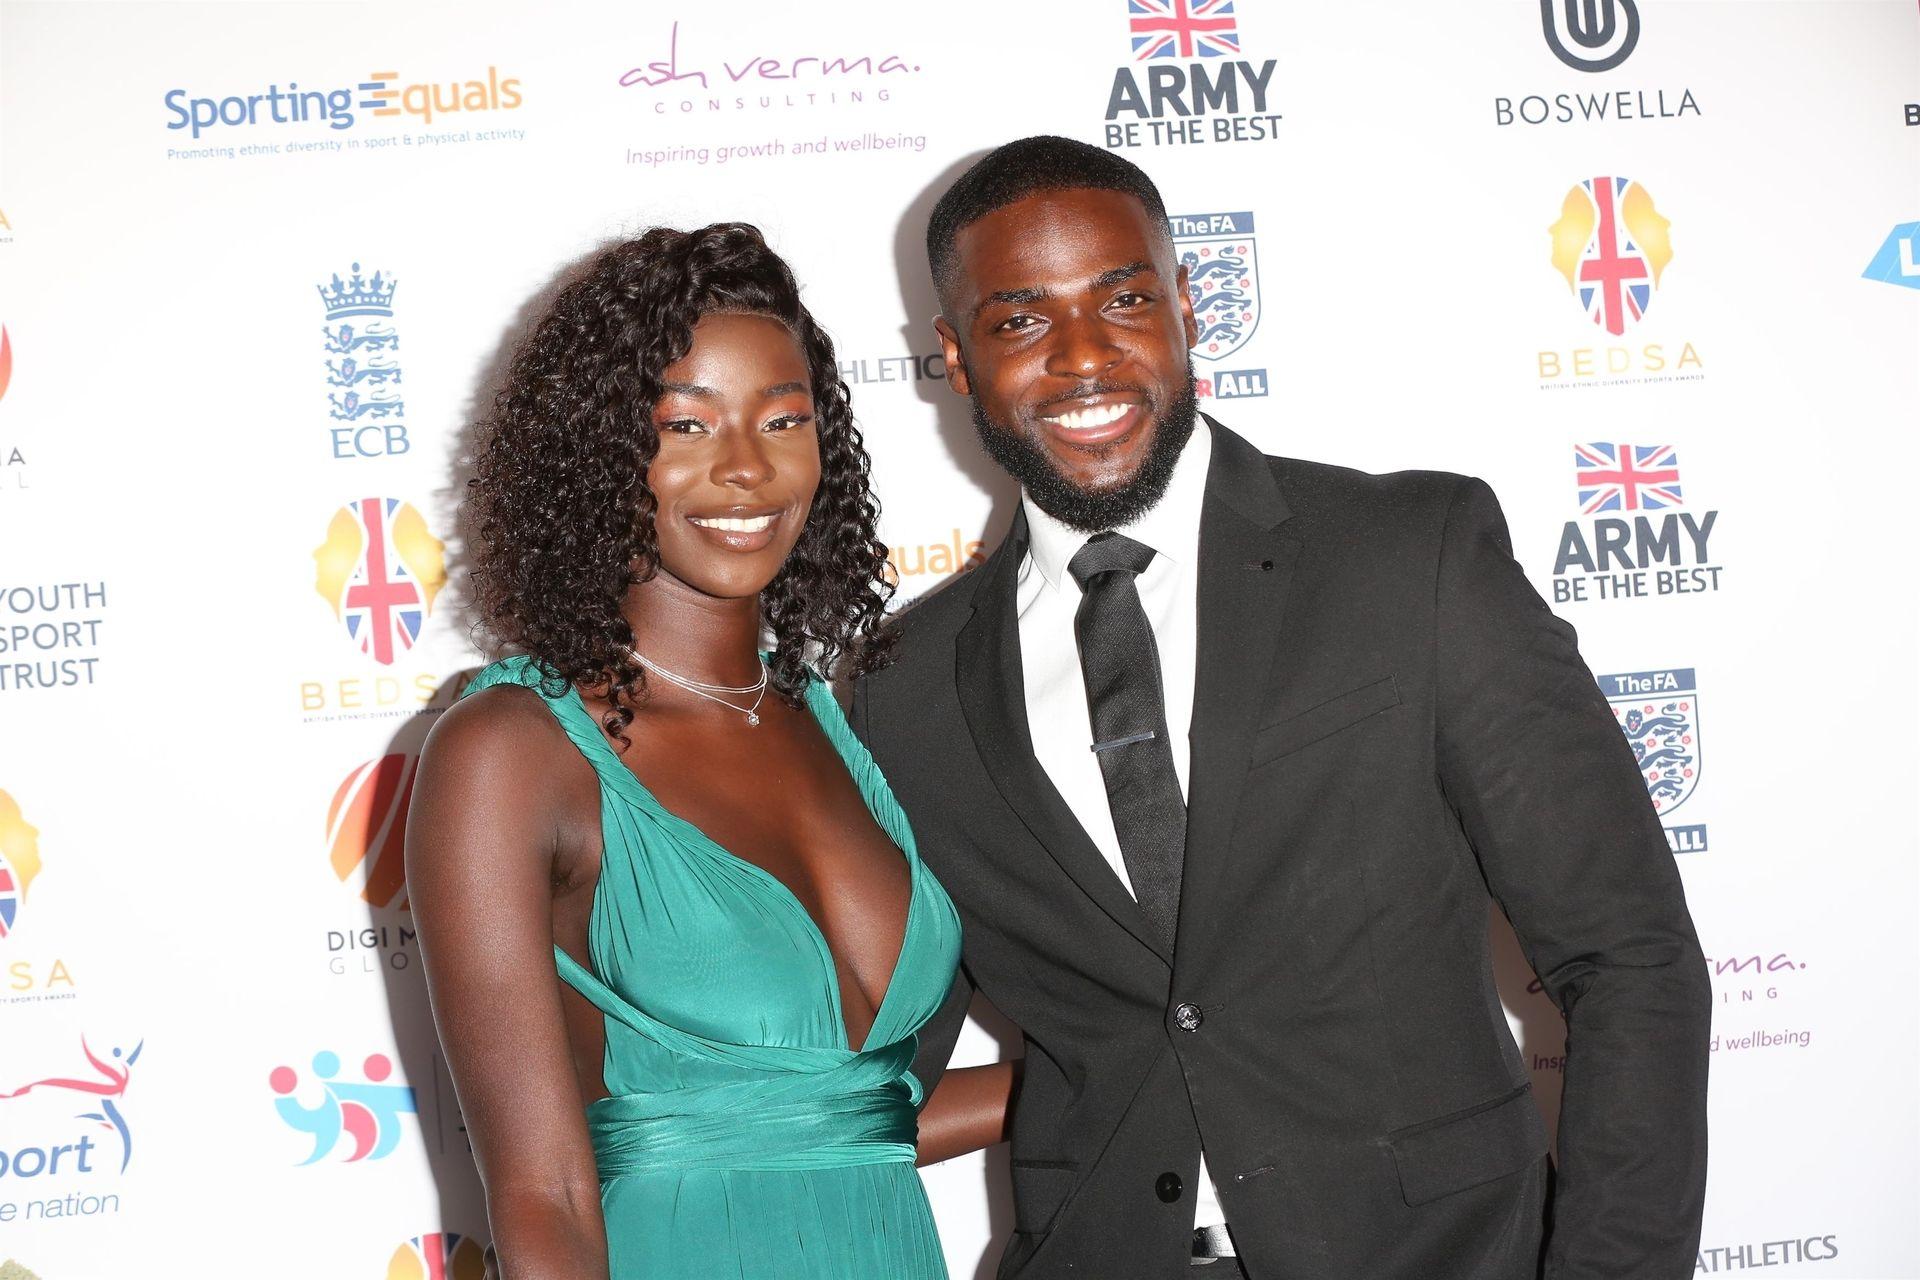 Mike Boateng & Priscilla Anyabu Are Seen At British Ethnic Diversity Sports Awards 0017